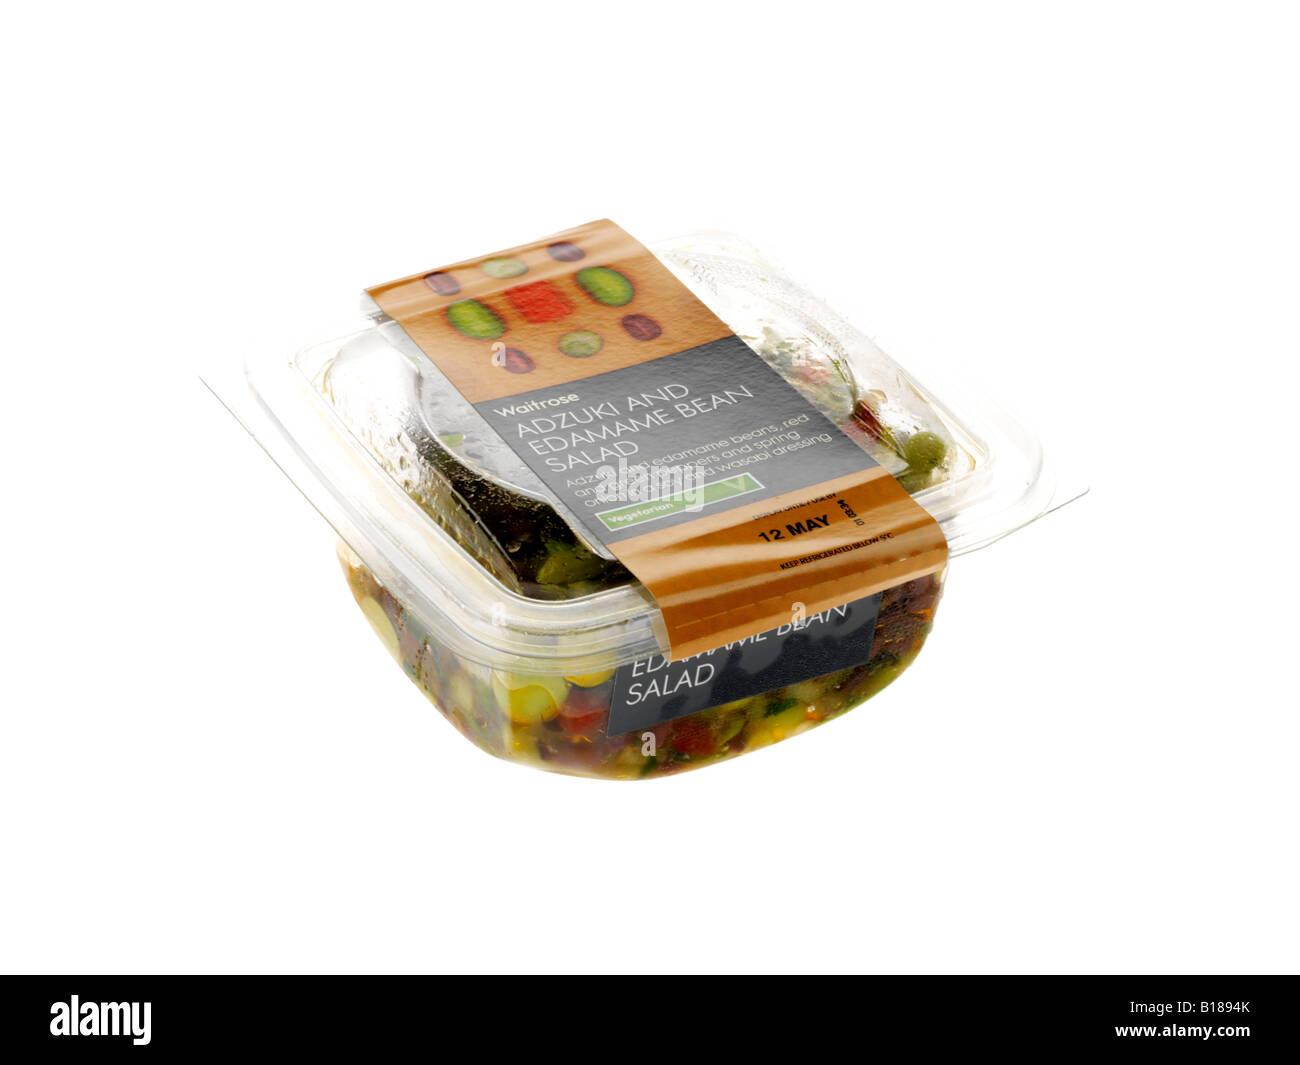 Adzuki and Edamame Bean Salad - Stock Image